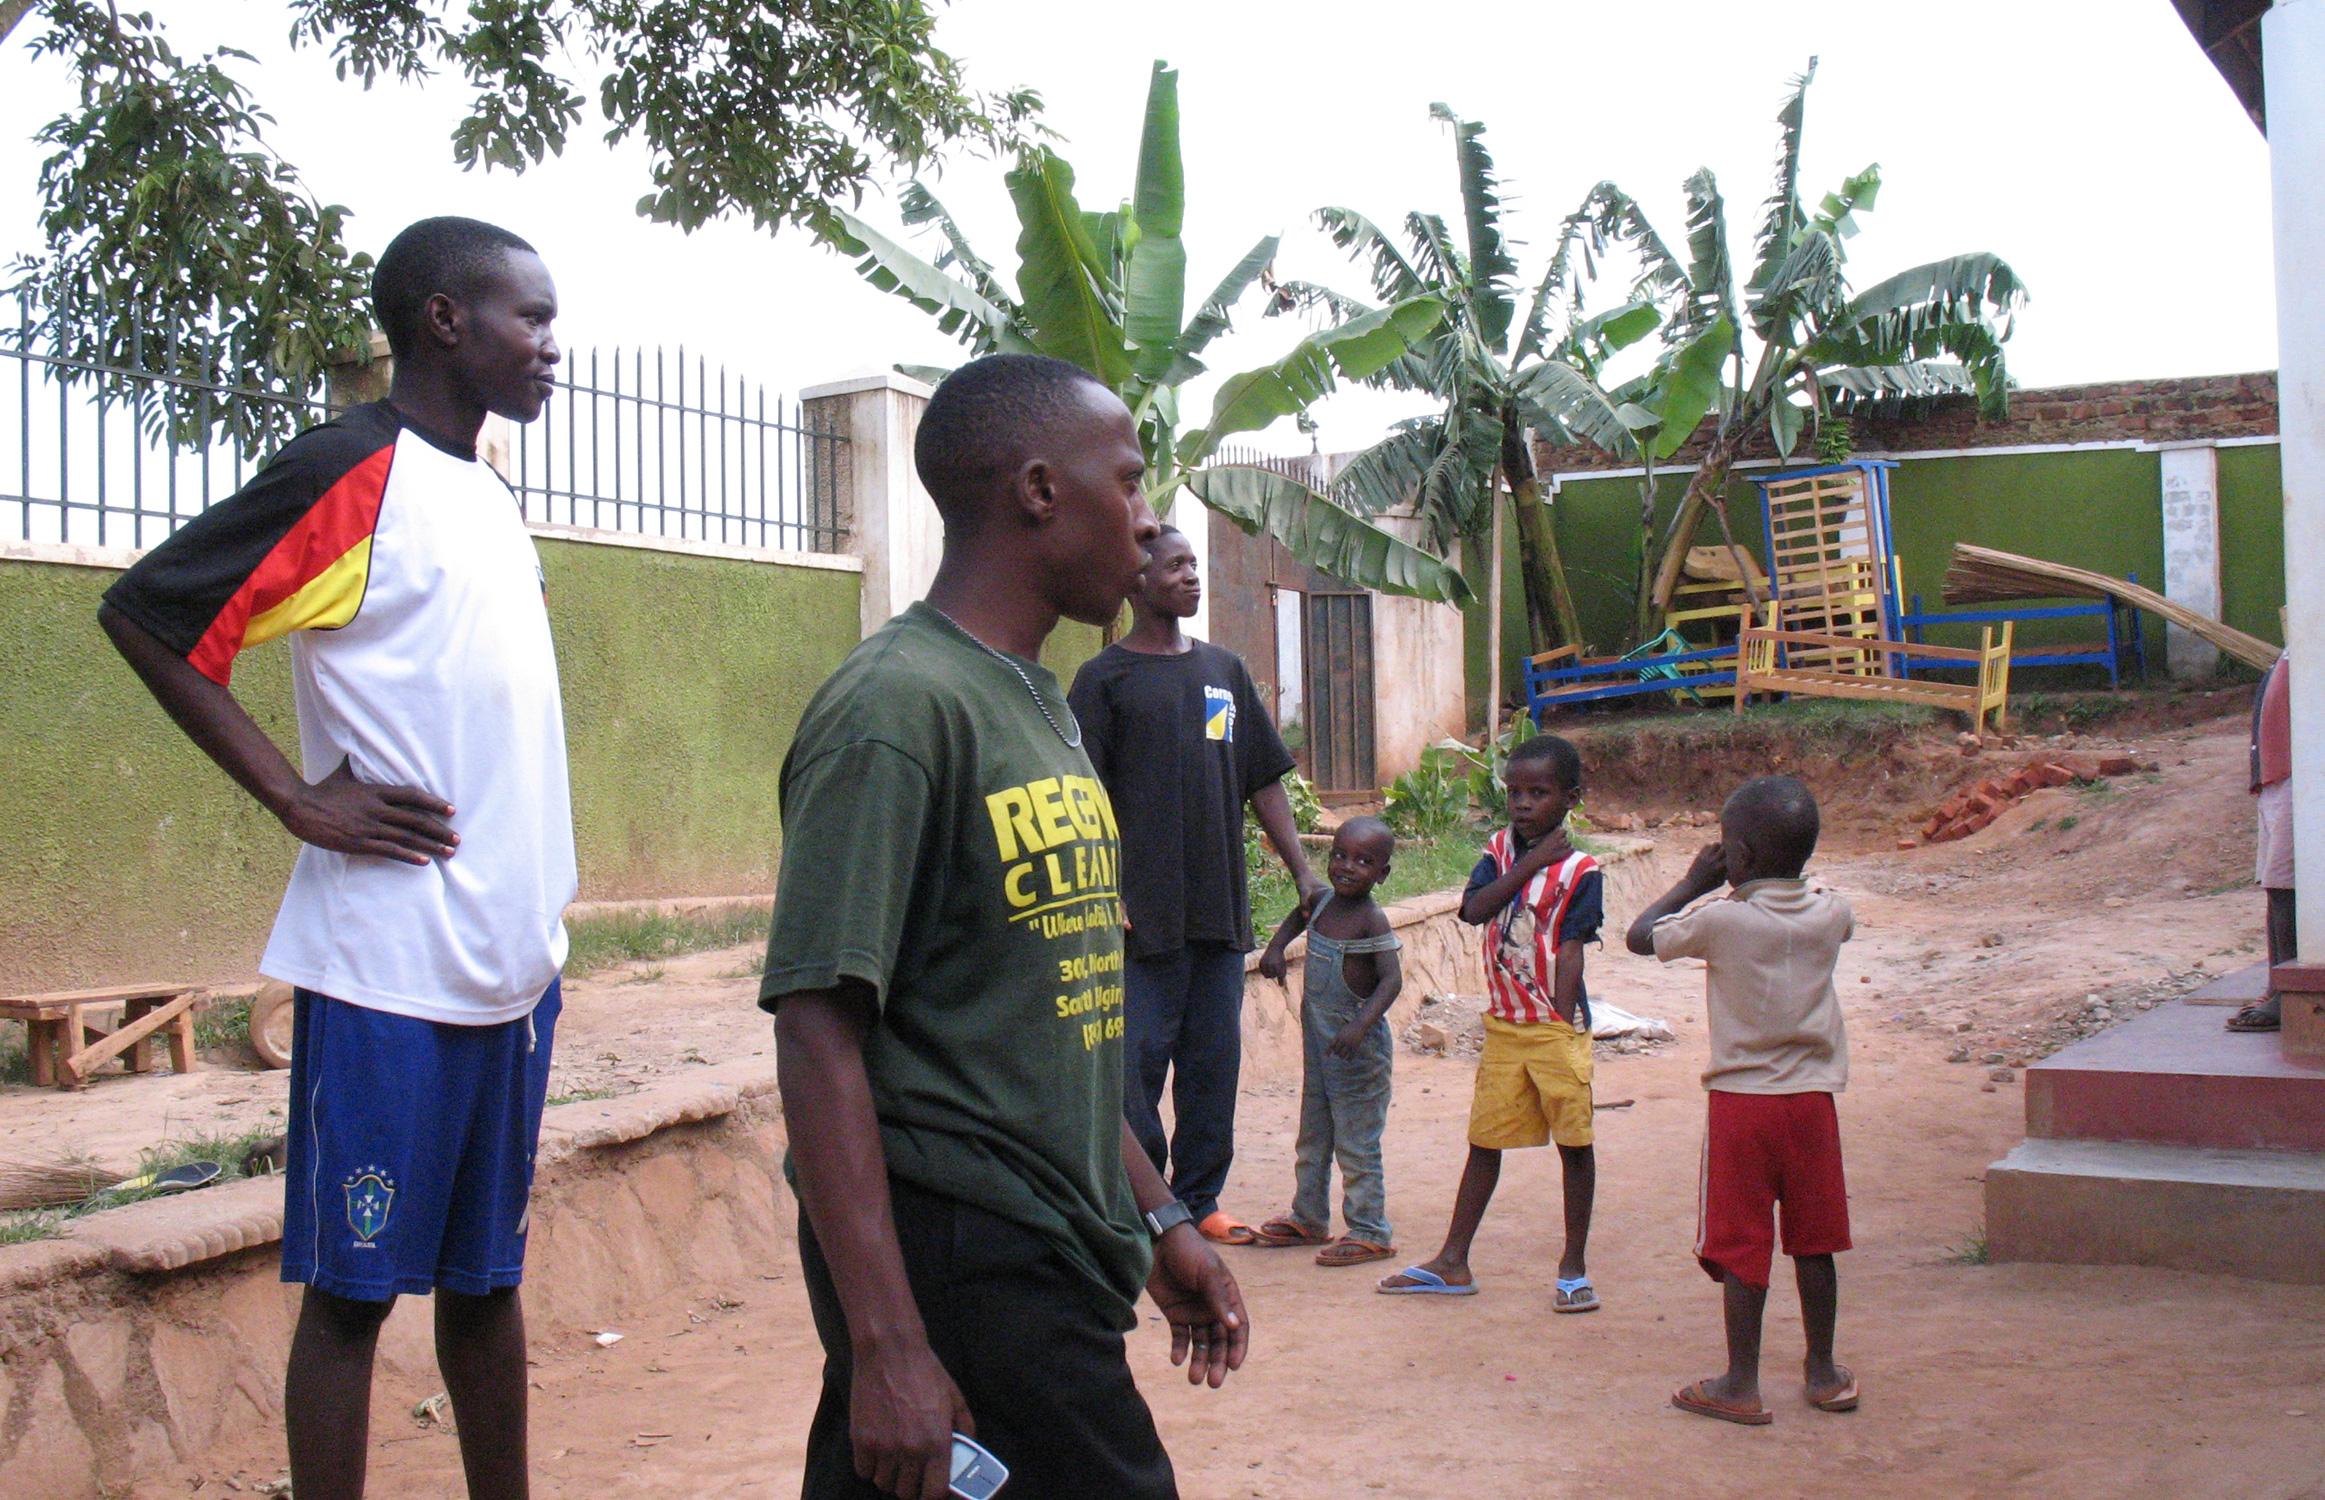 Geofrey Kalanzi (left) at the Home Again orphanage in Kampala, Uganda (courtesy of Alex Fournier)